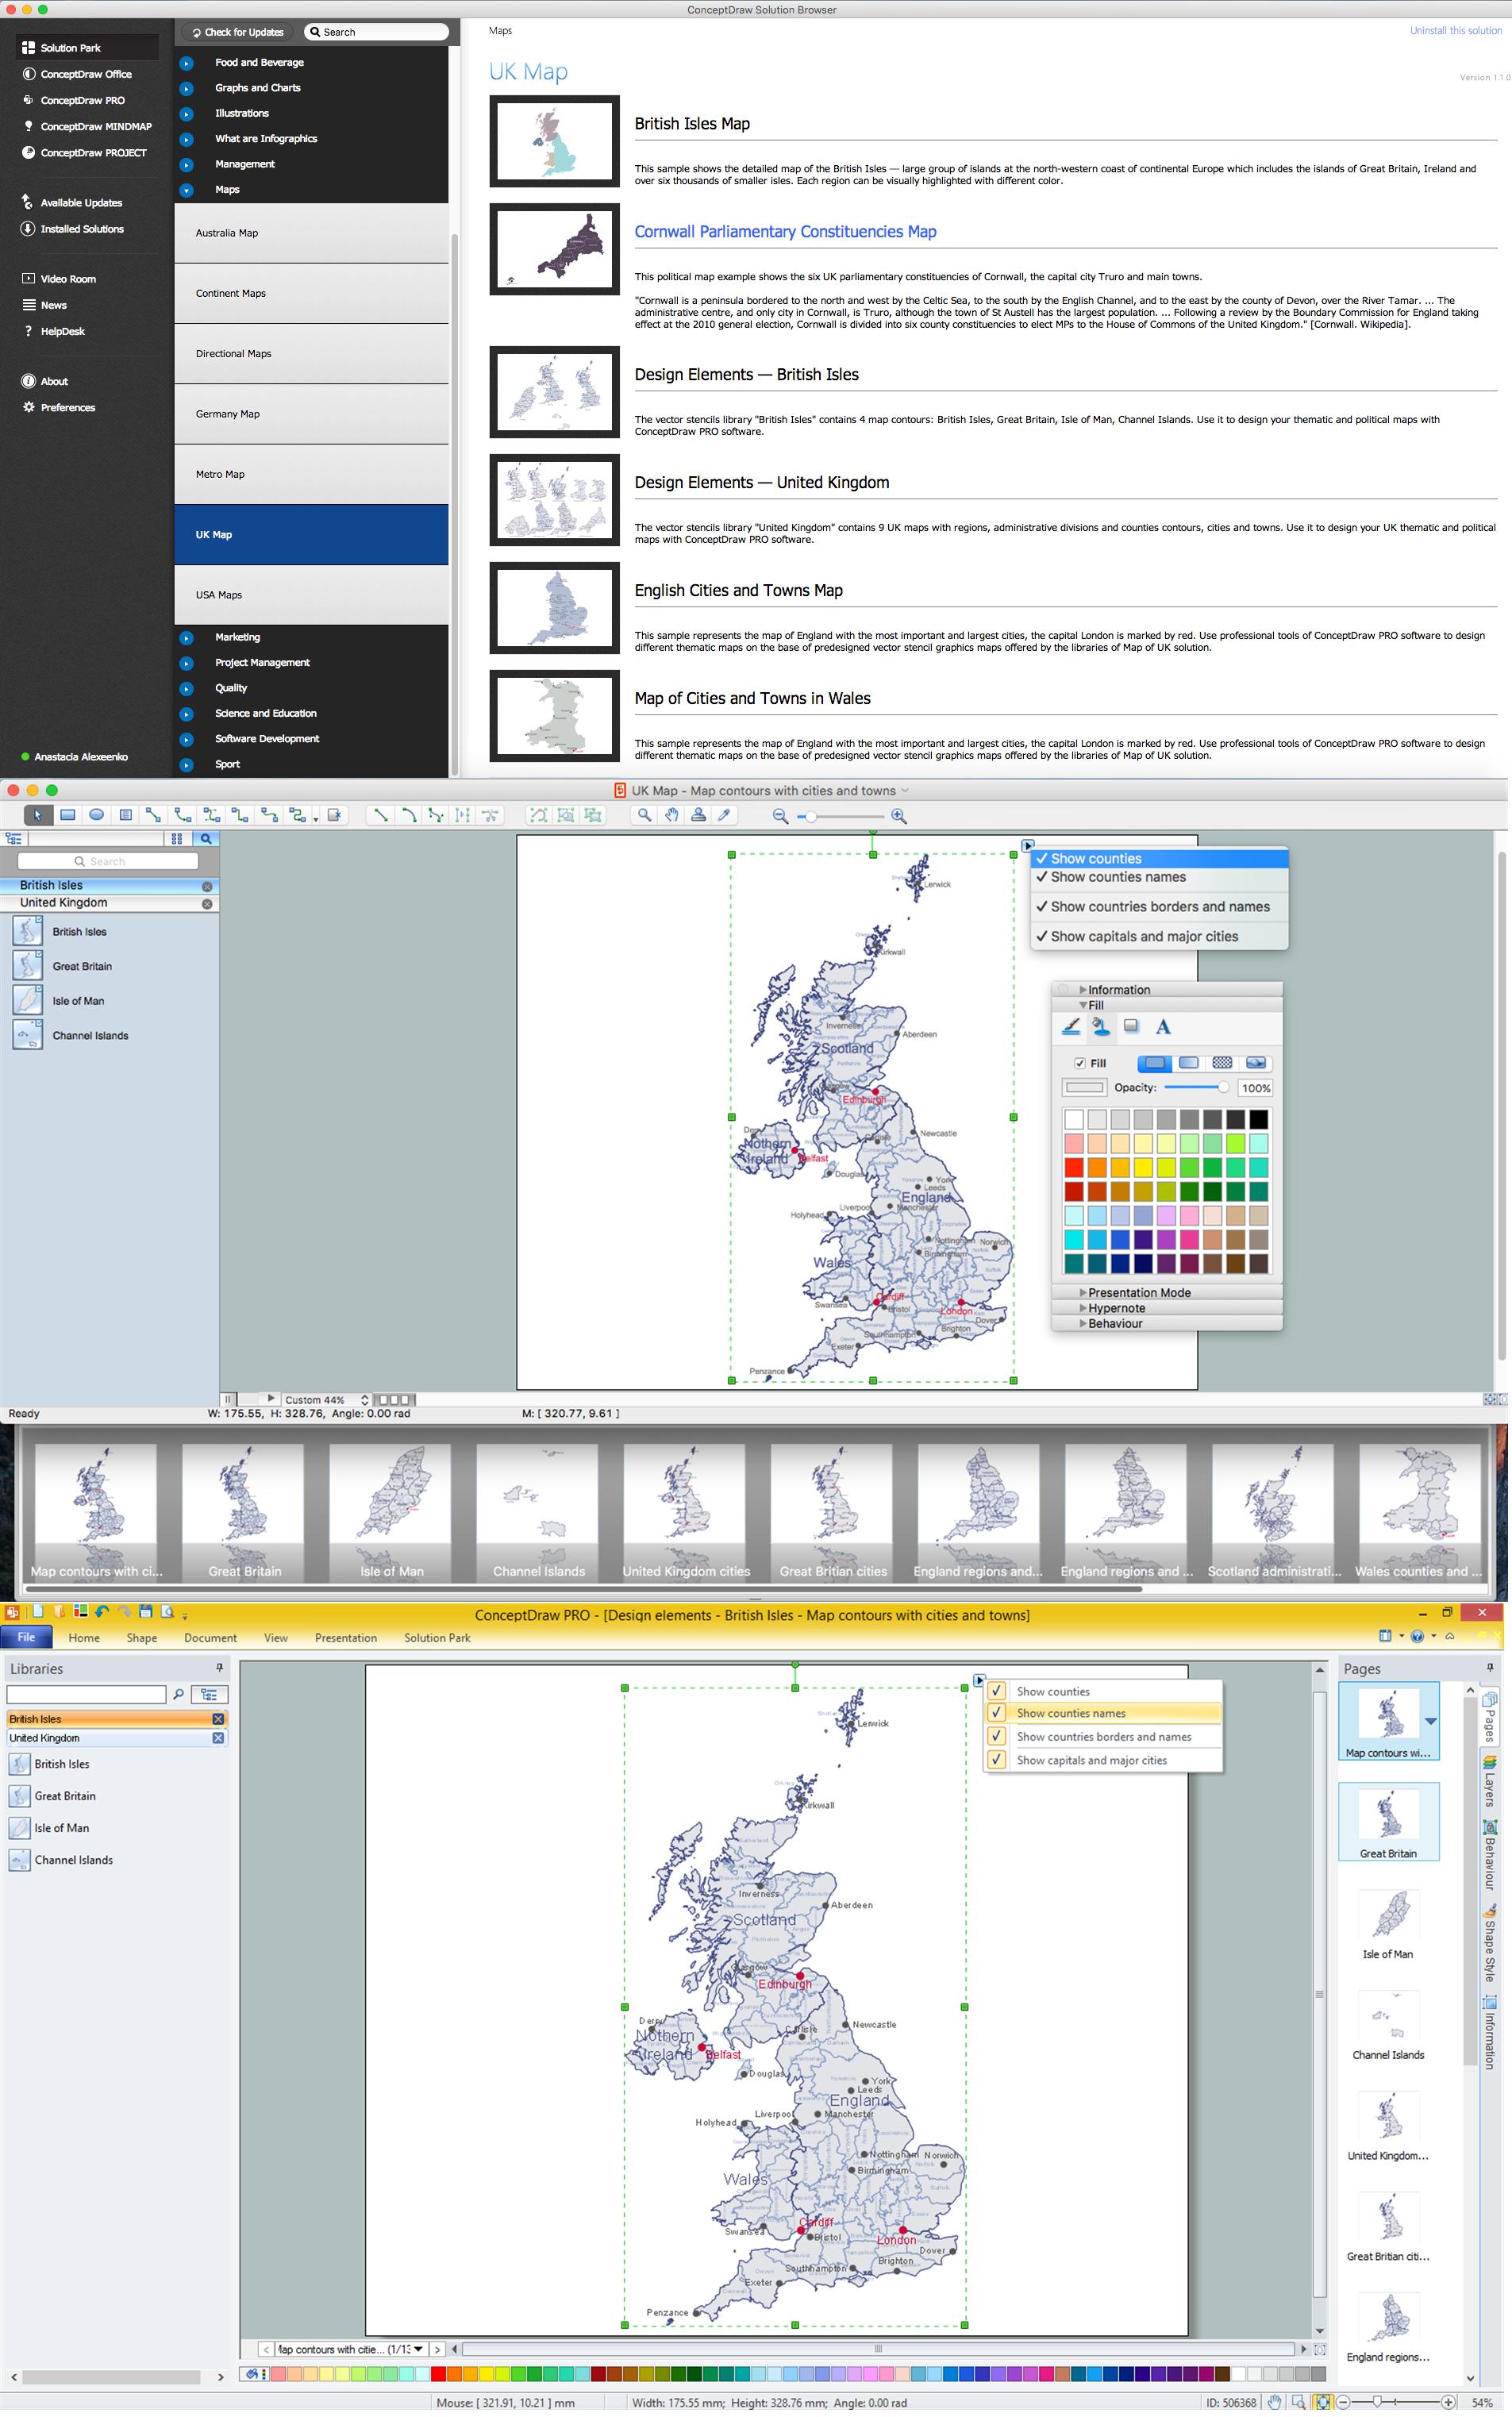 Contours Map of UK